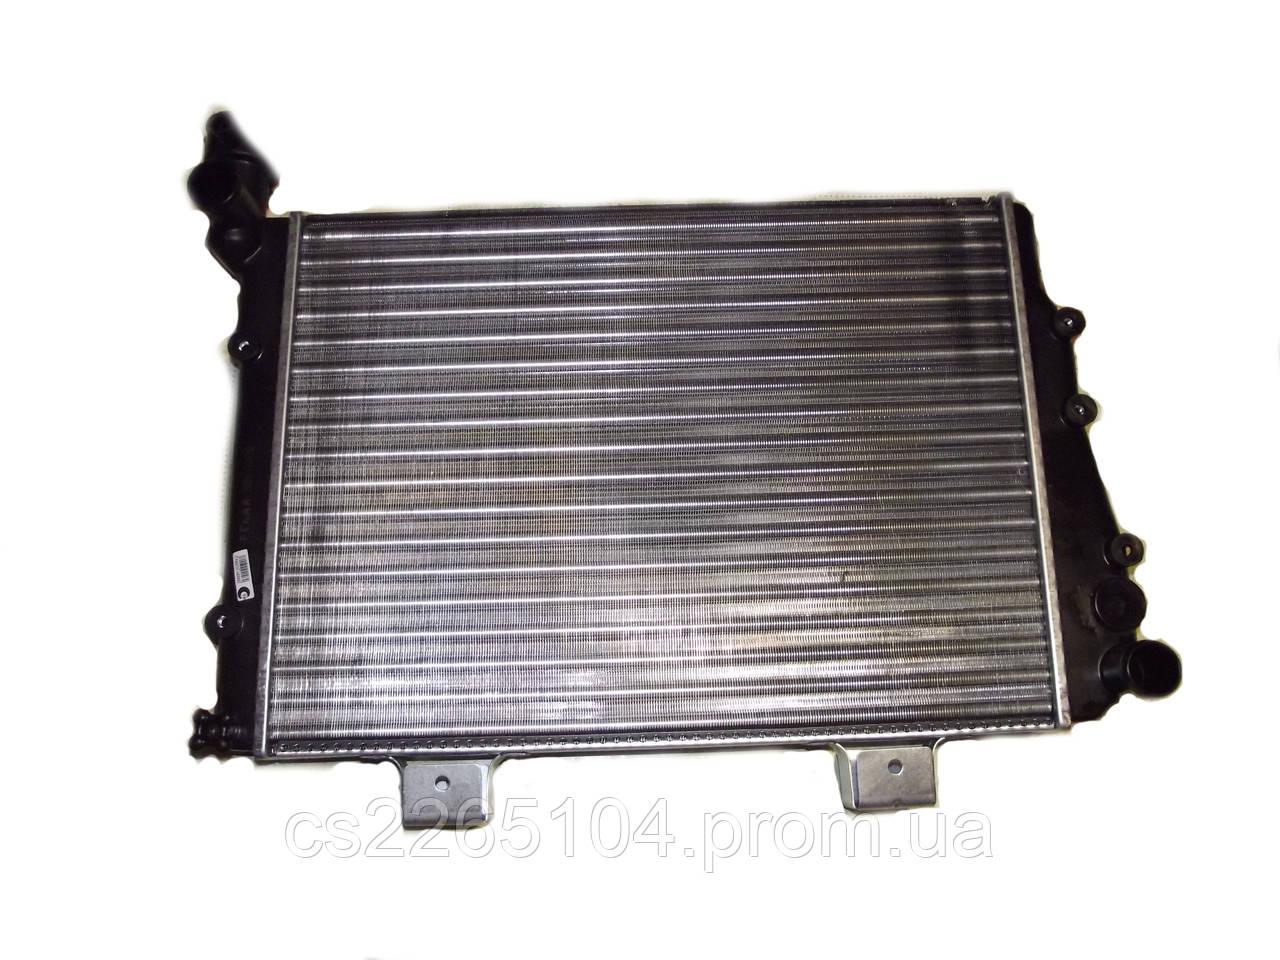 Радиатор охлаждения ВАЗ 2106 Пекар